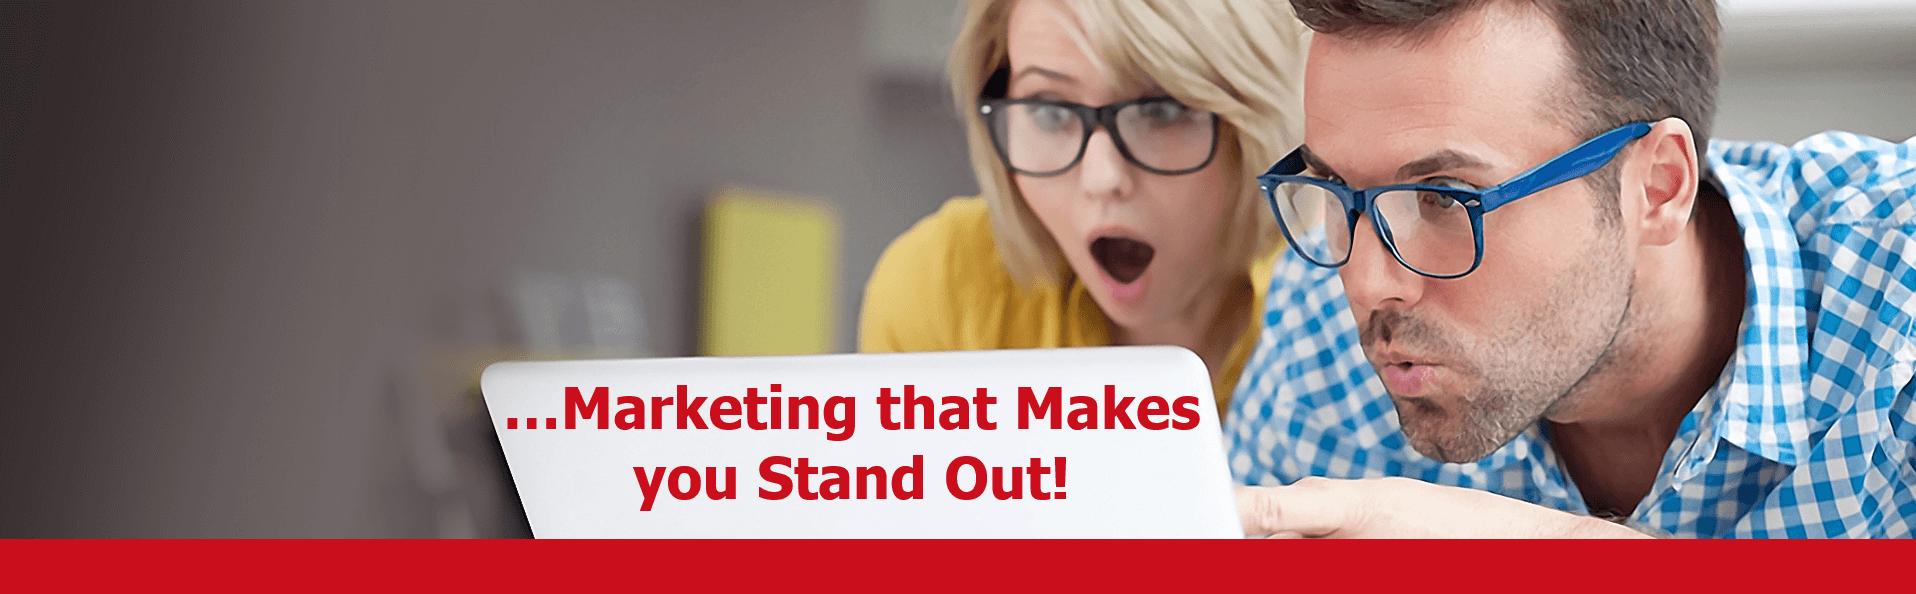 Stickybeak Marketing Makes You Stand Out.